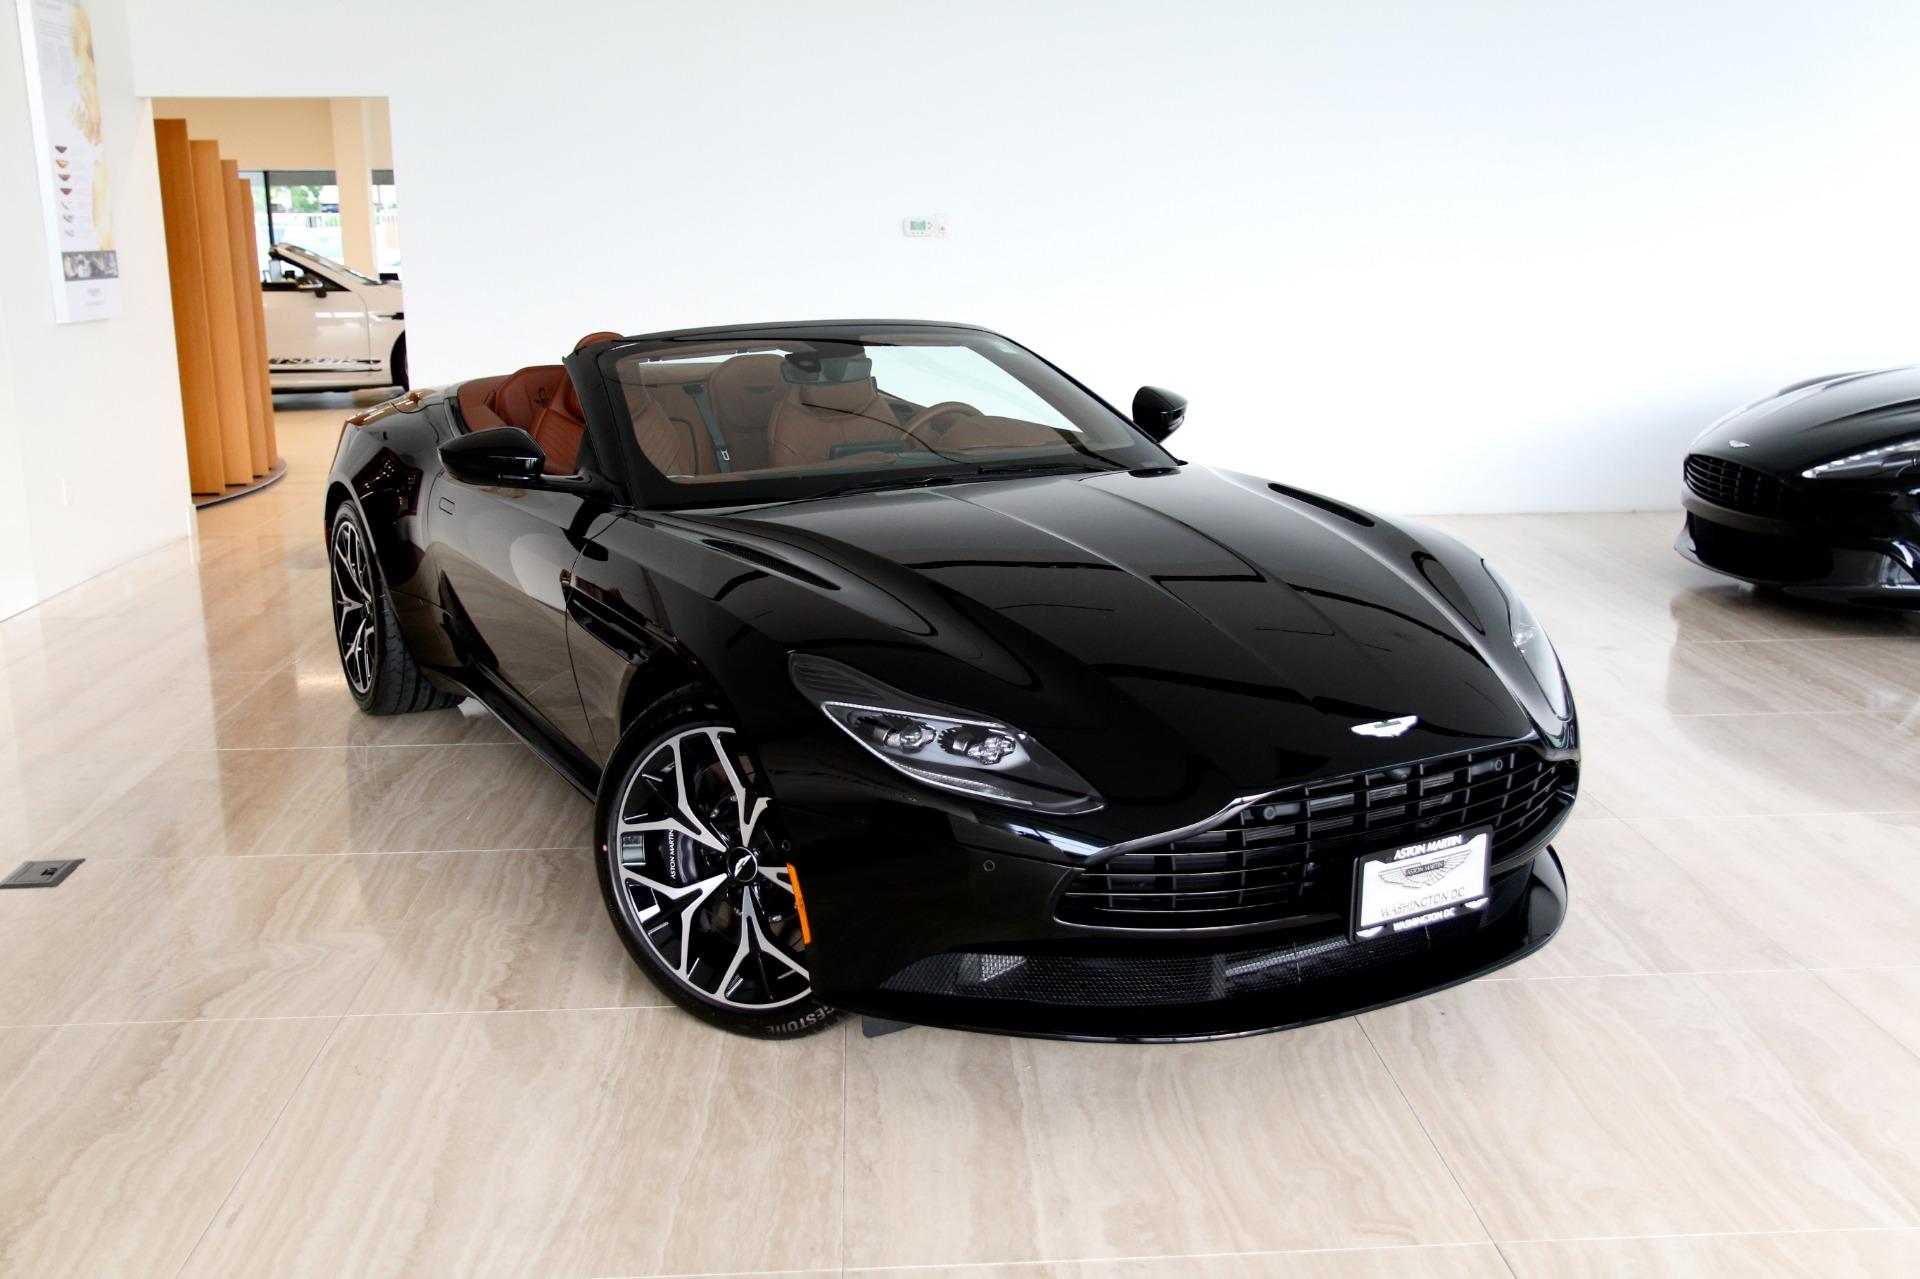 2019 Aston Martin Db11 Volante Stock 9nm05654 For Sale Near Vienna